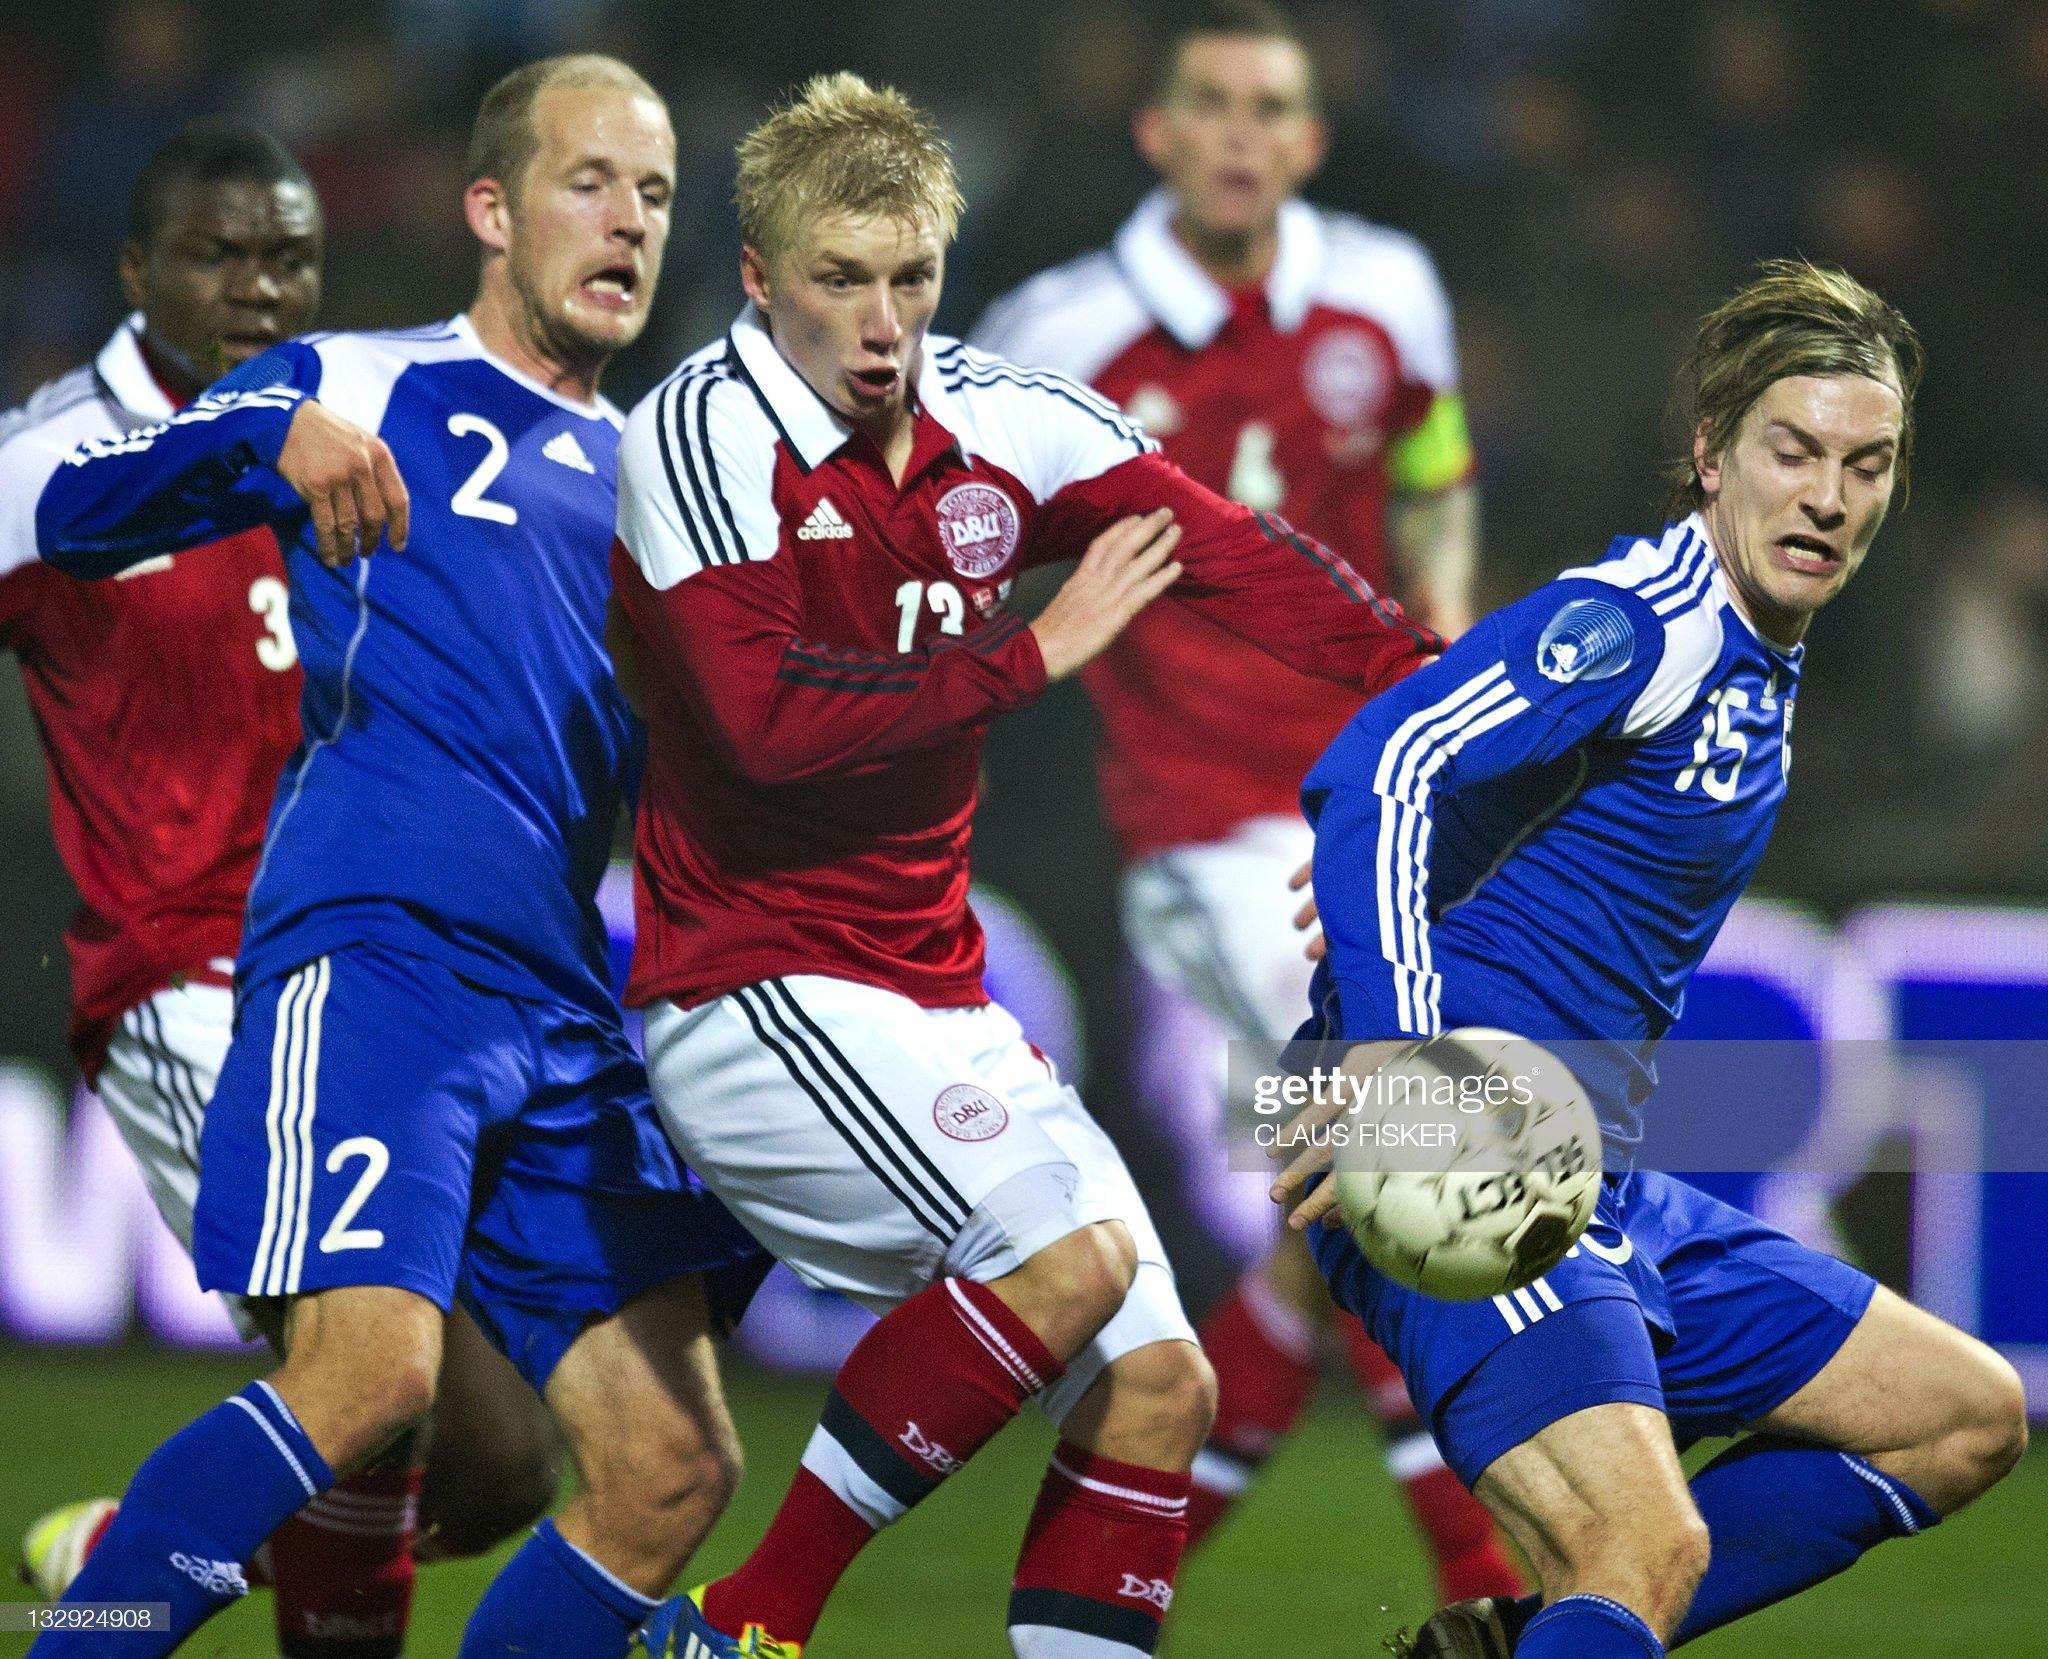 Denmark vs Finland preview, prediction and odds